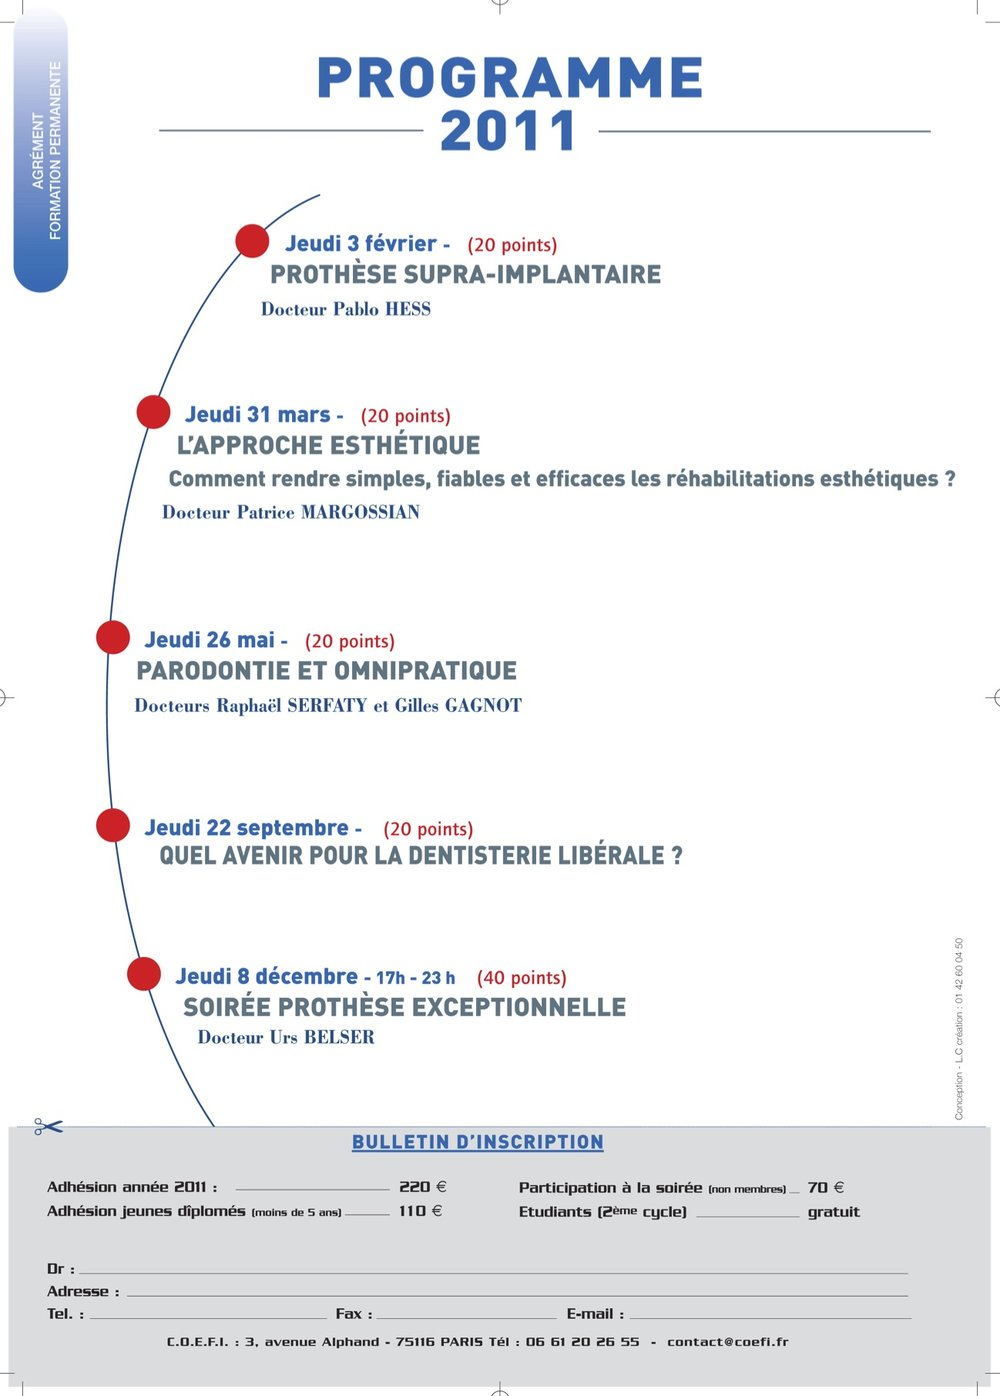 programme 2011.jpg